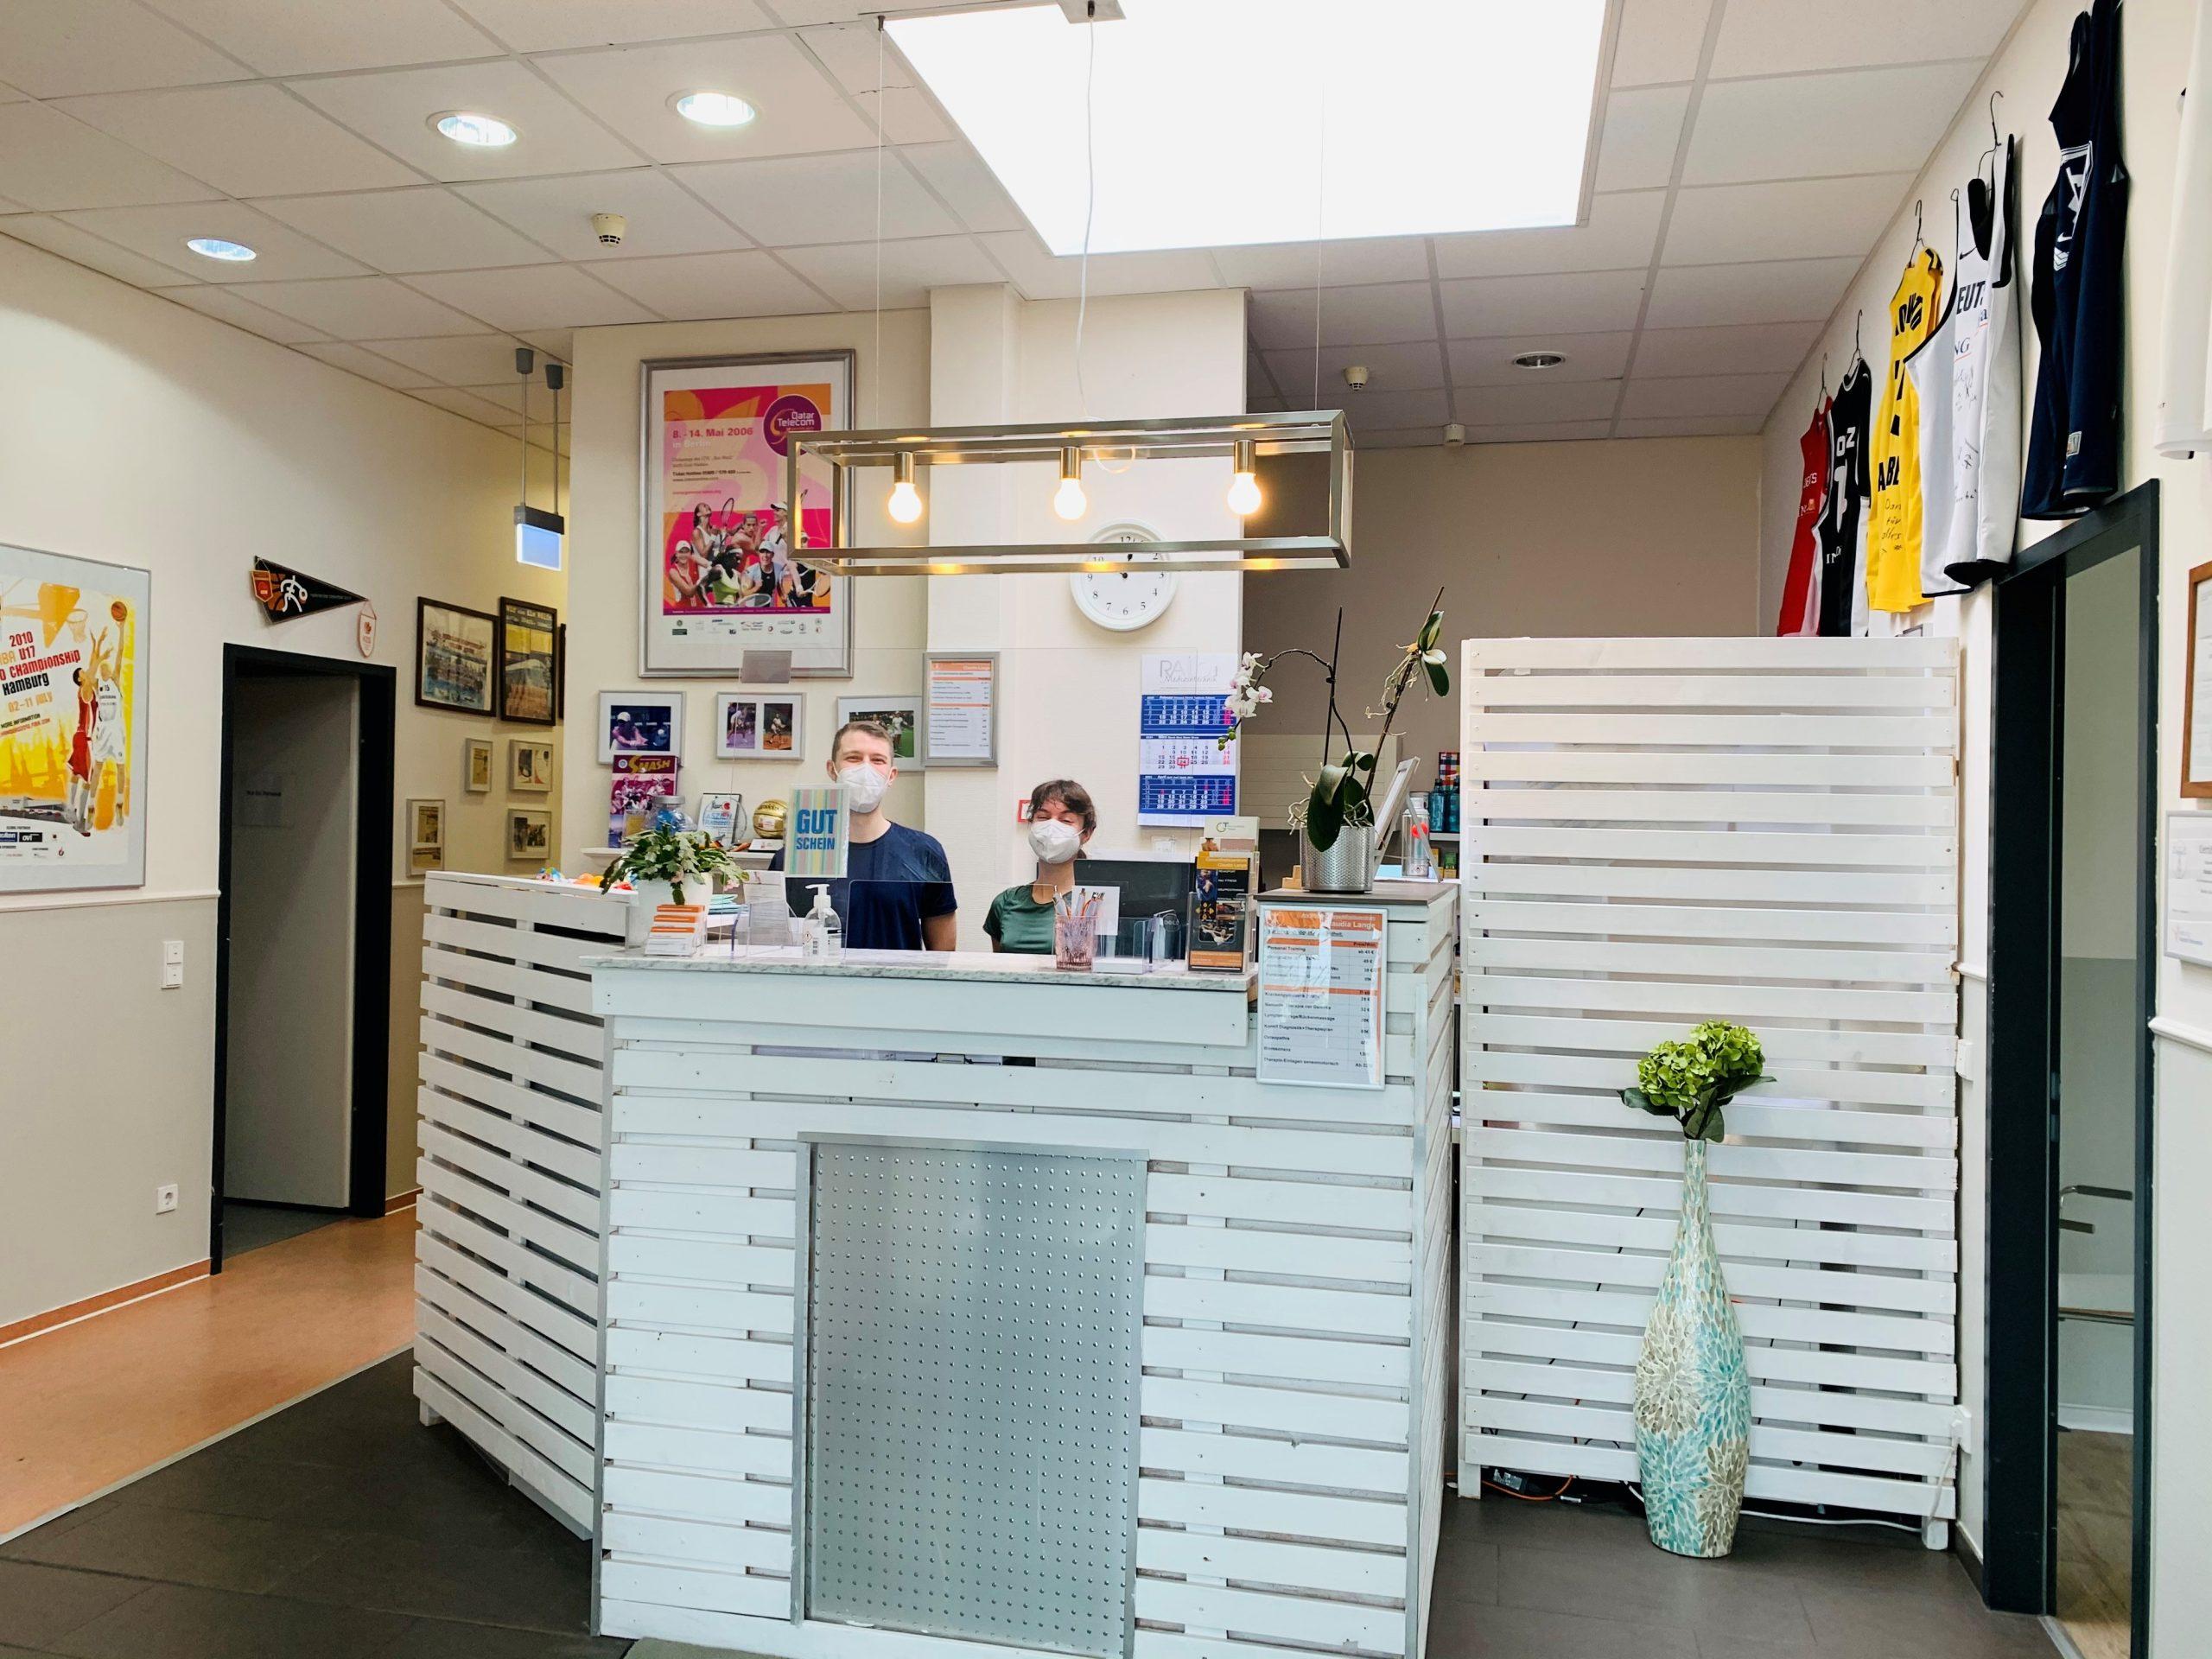 Standort in Berlin - Ars Medendi Gesundheitszentrum Claudia Lange